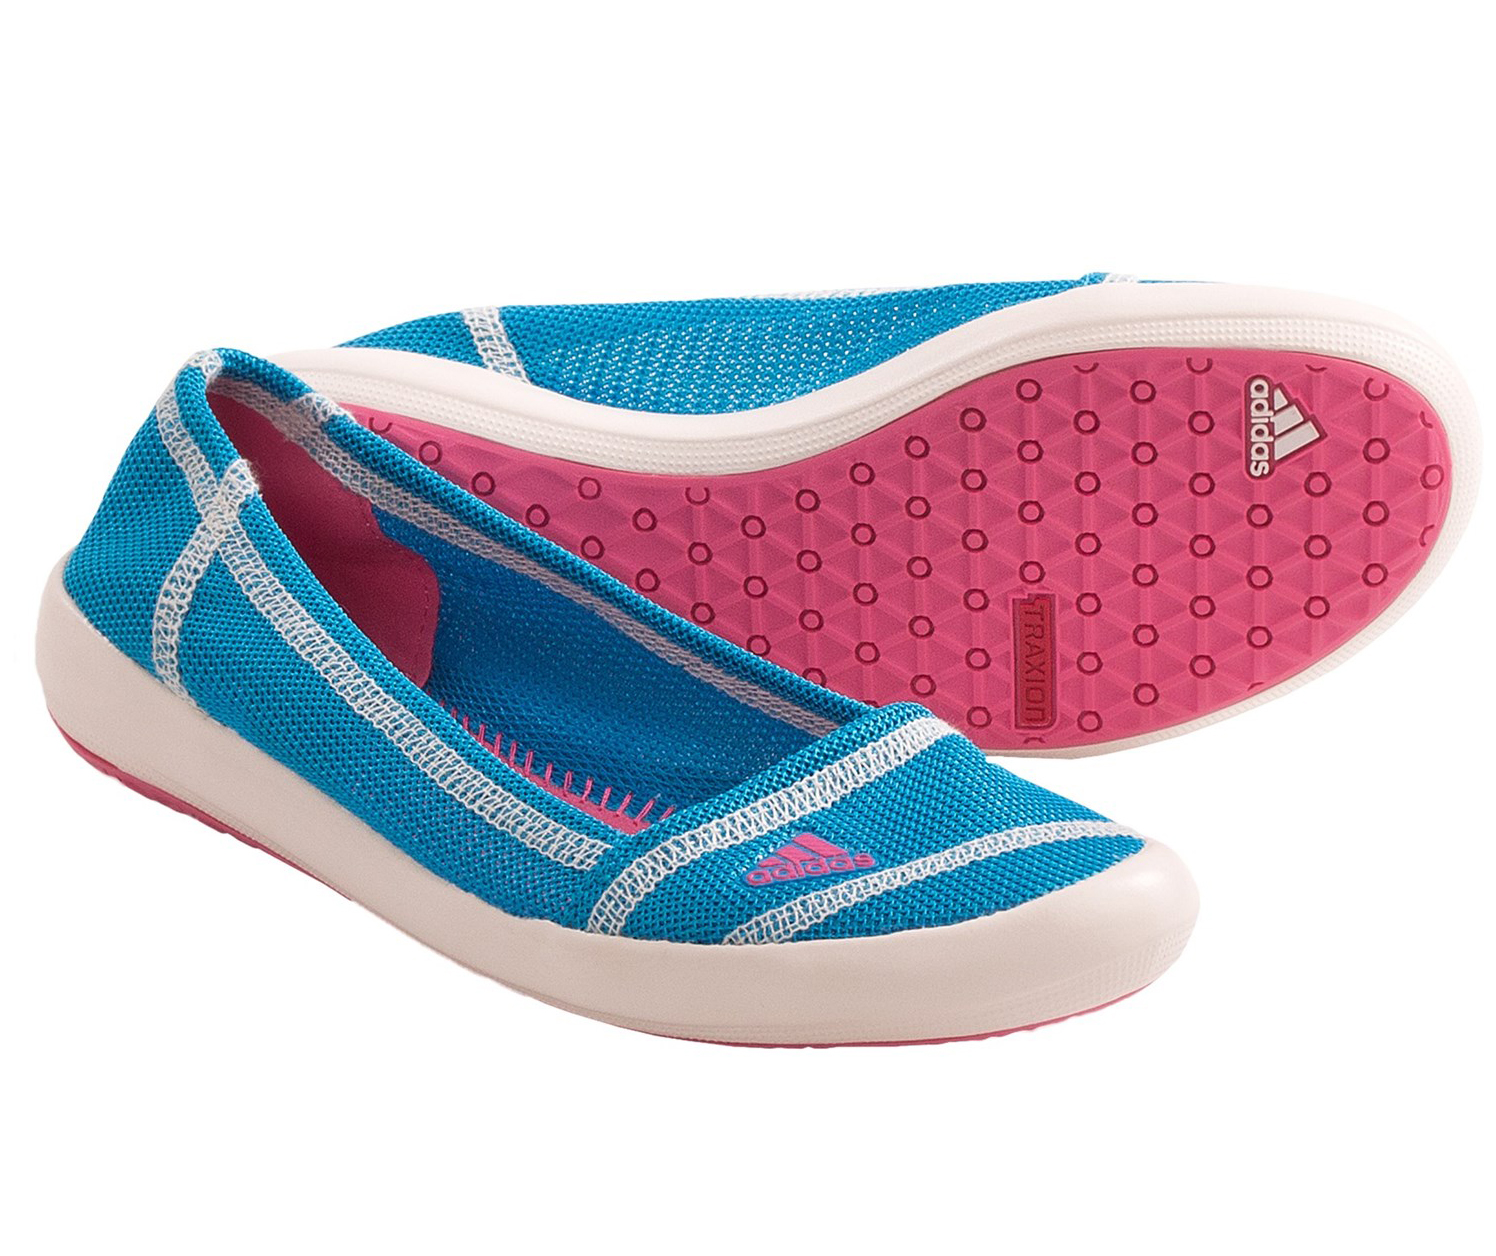 Shoeshoebedo Womens Boat Shoes